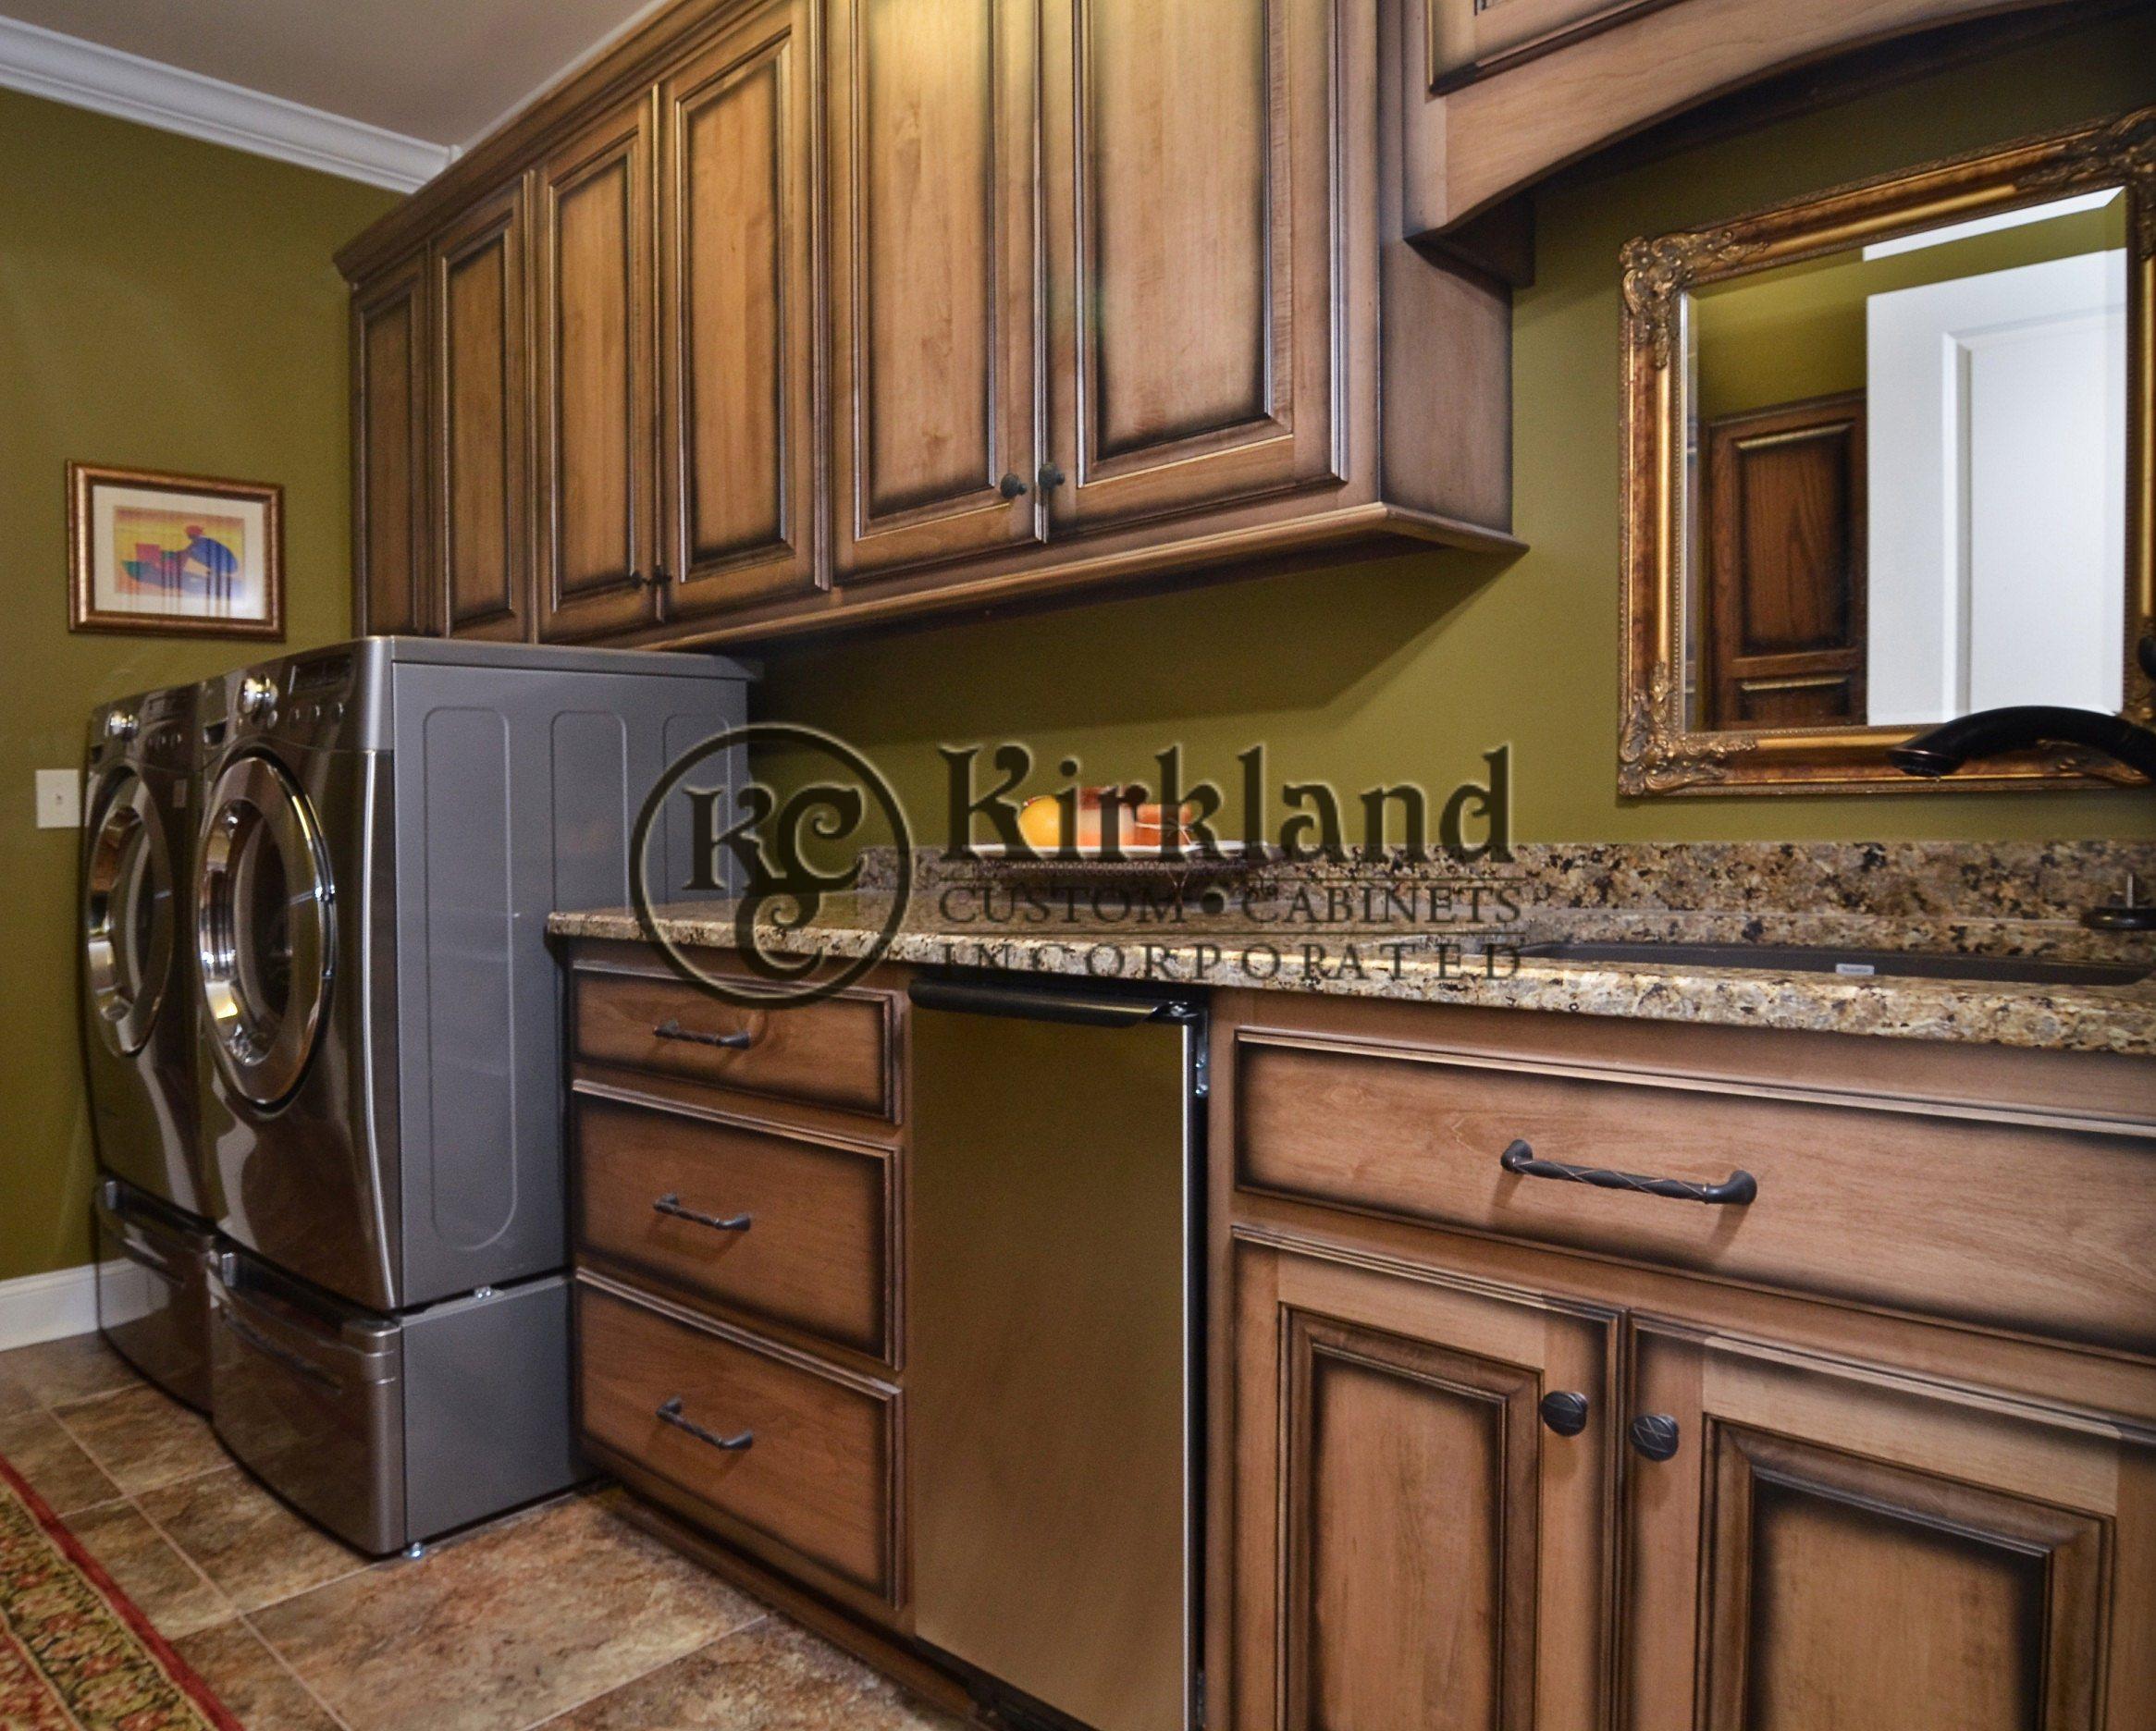 distressed wood kitchen cabinets wallpaper for backsplash custom 12  kirkland and innovations